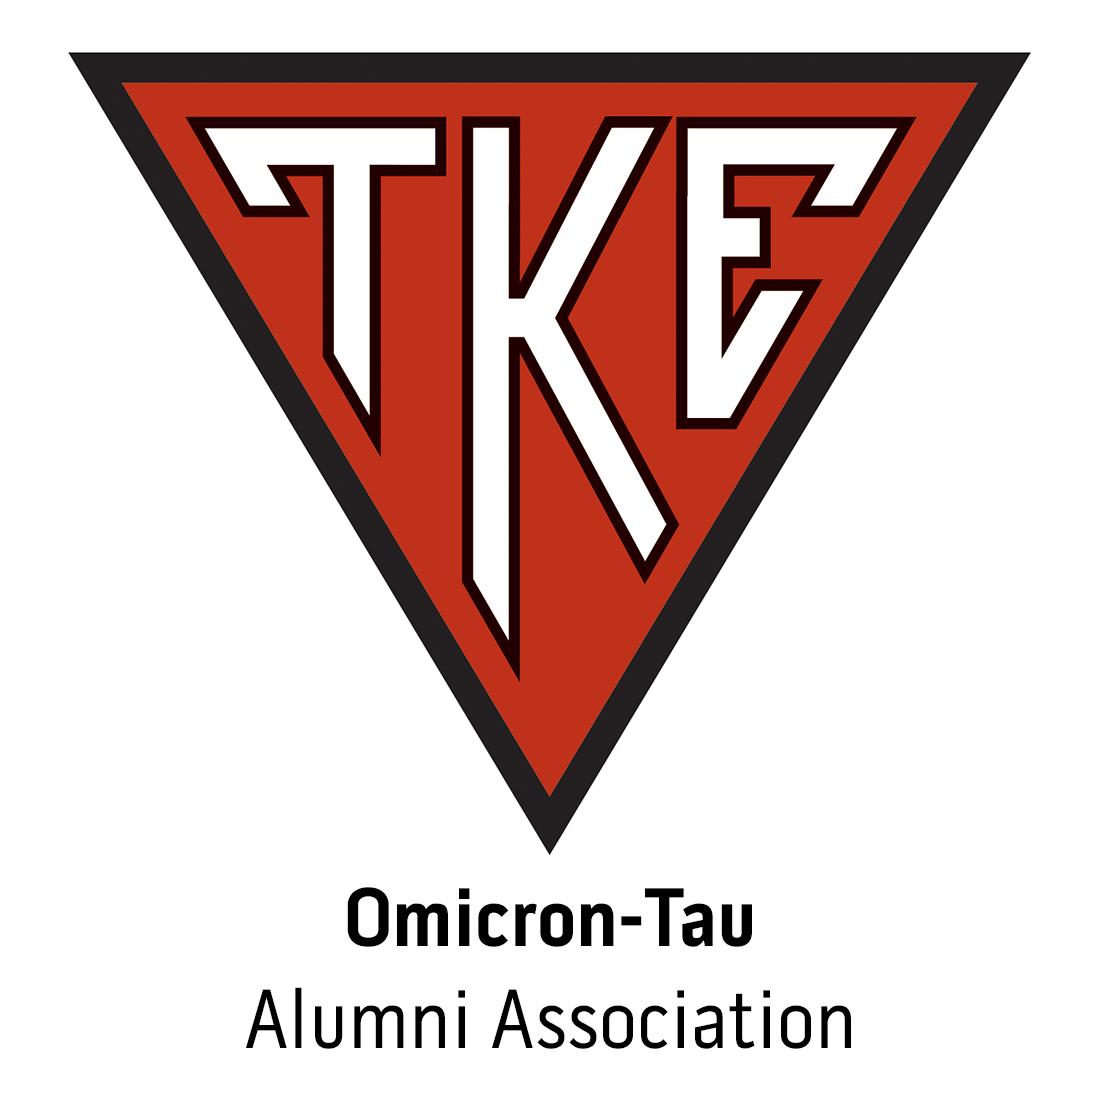 Omicron-Tau Alumni Association for Columbus State University